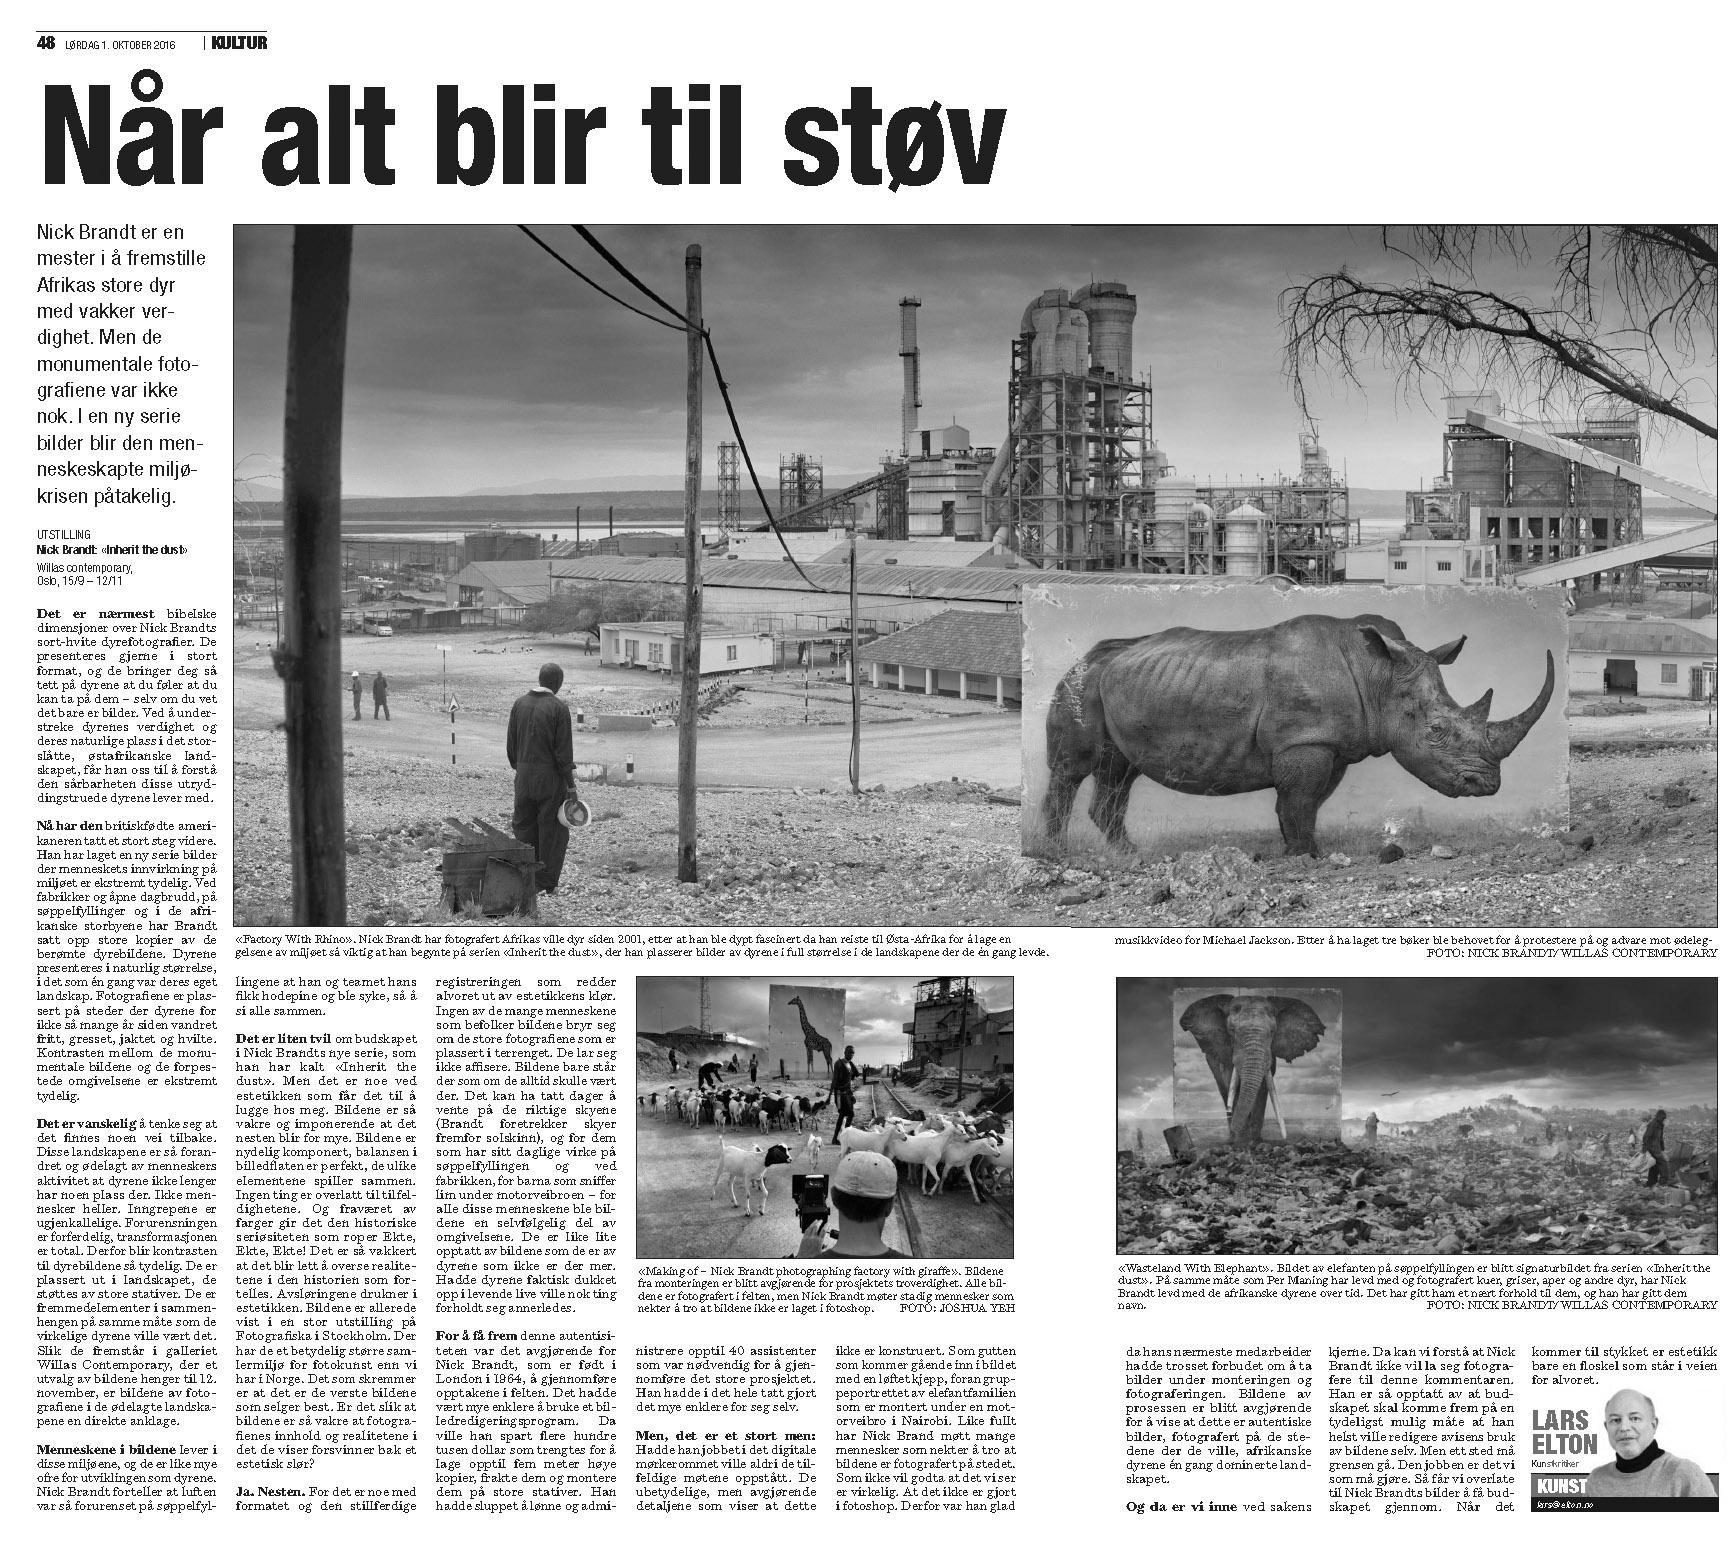 Dagsavisen - Nick Brandt